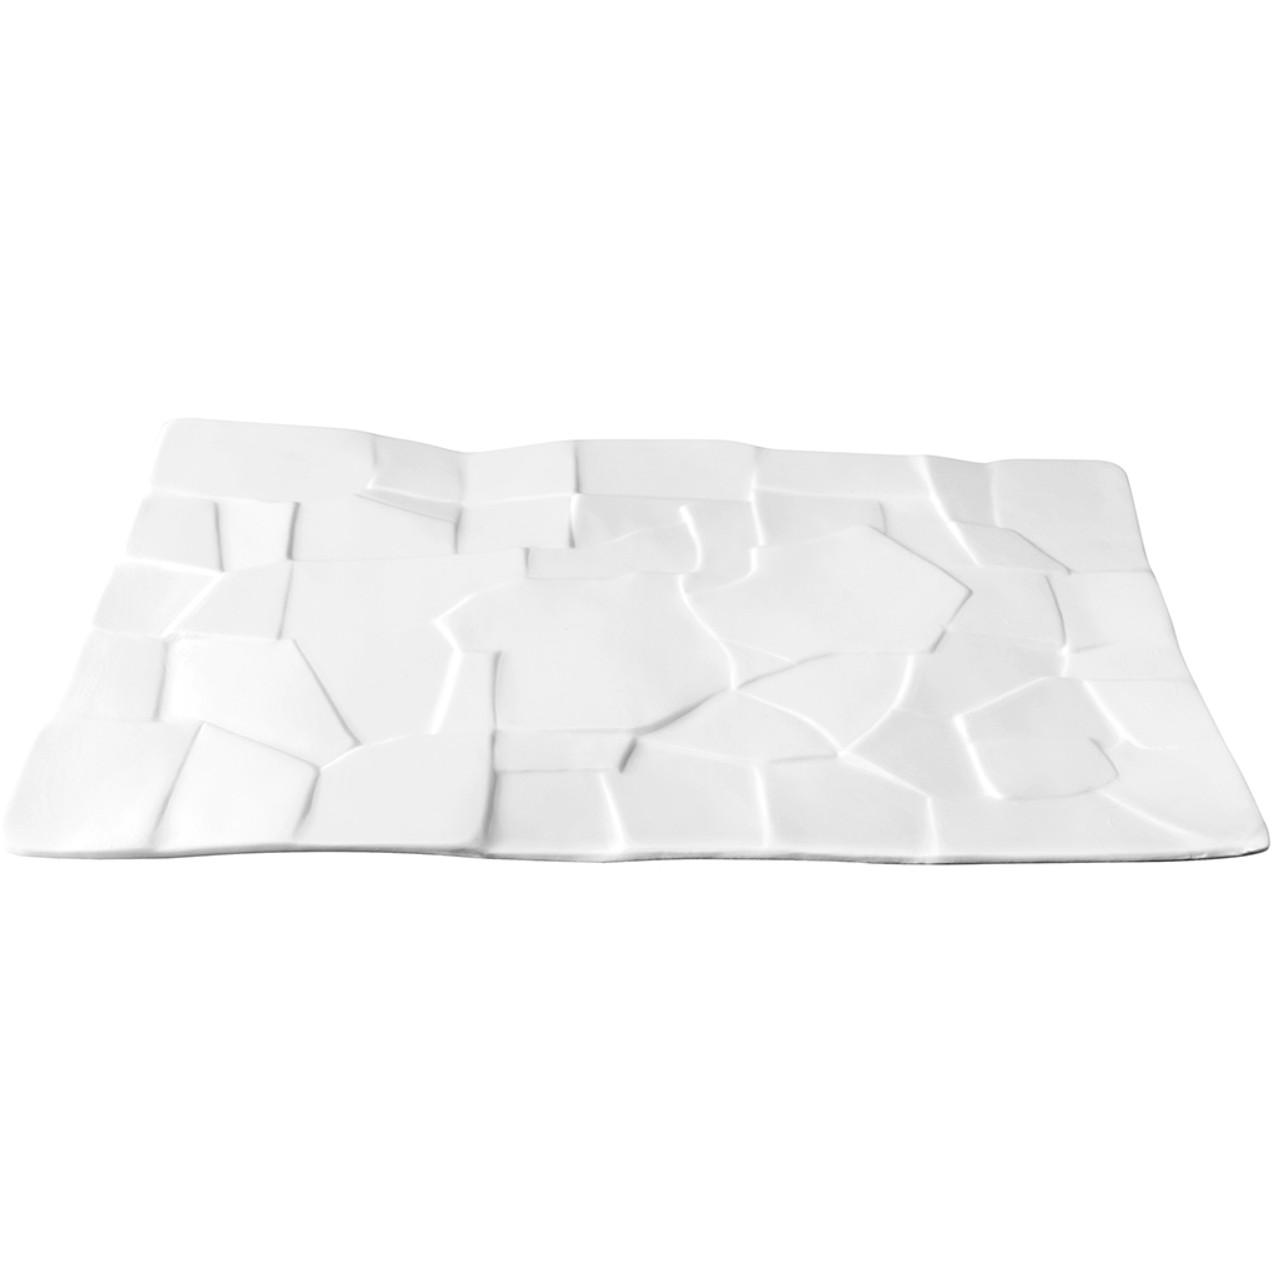 Trencadis Porcelain Plate Rectangle 33cm x 20cm